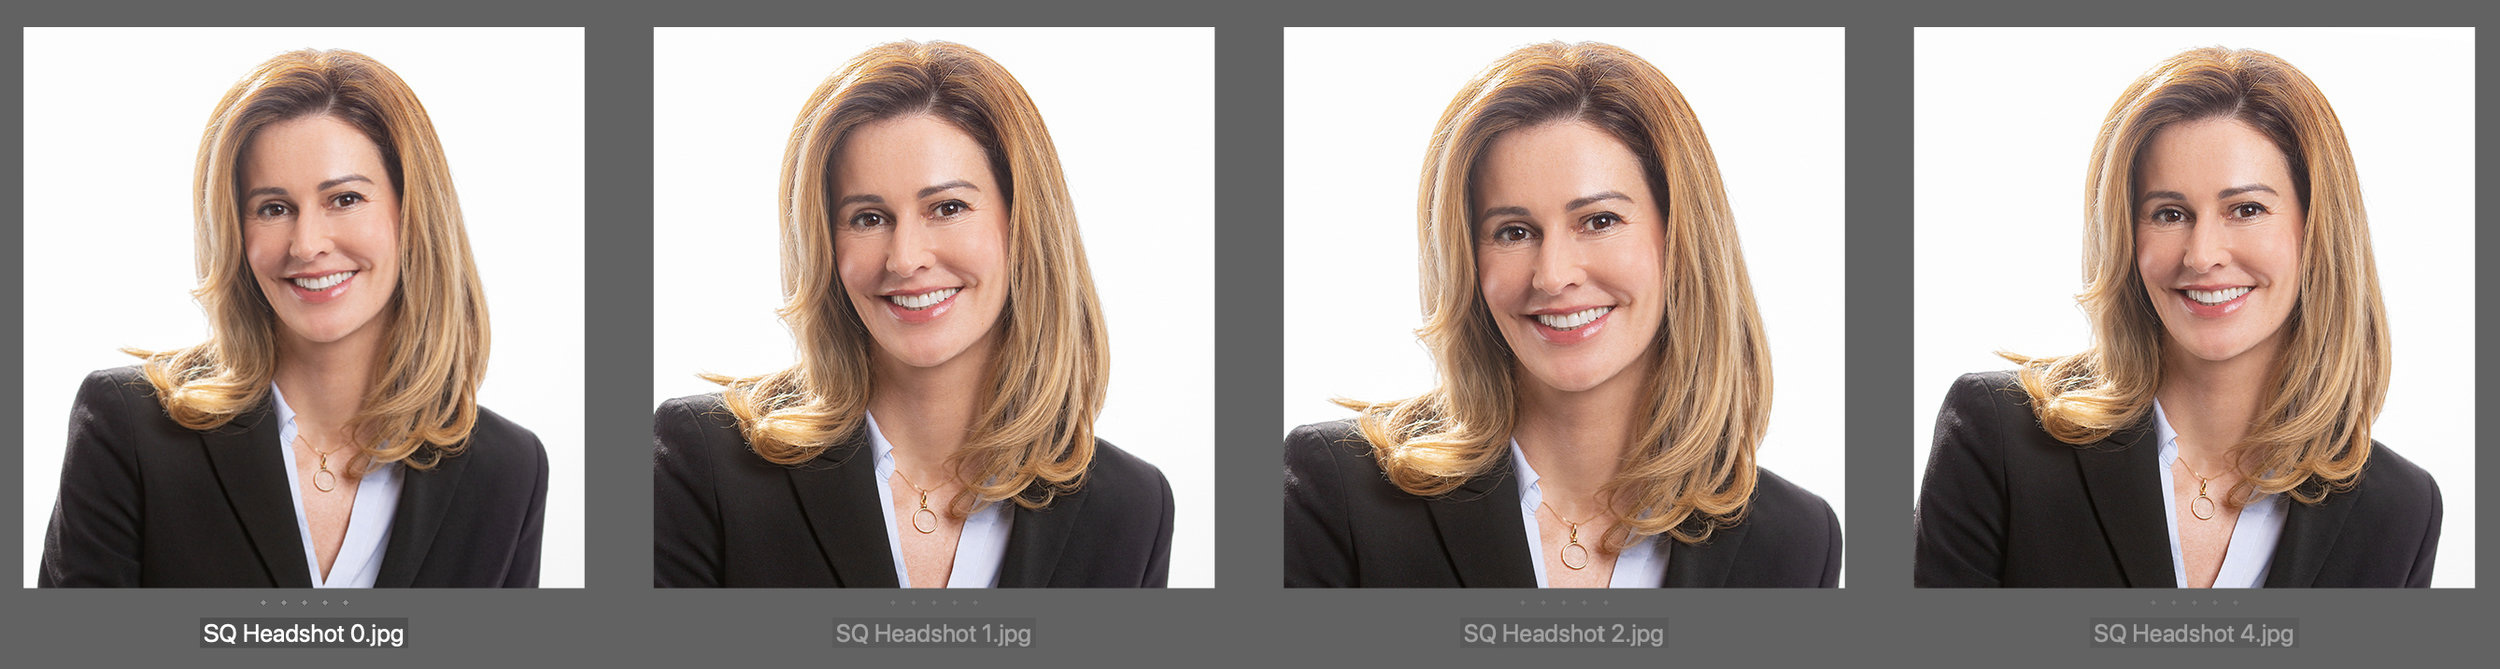 SQ+Headshot+4+copy.jpg